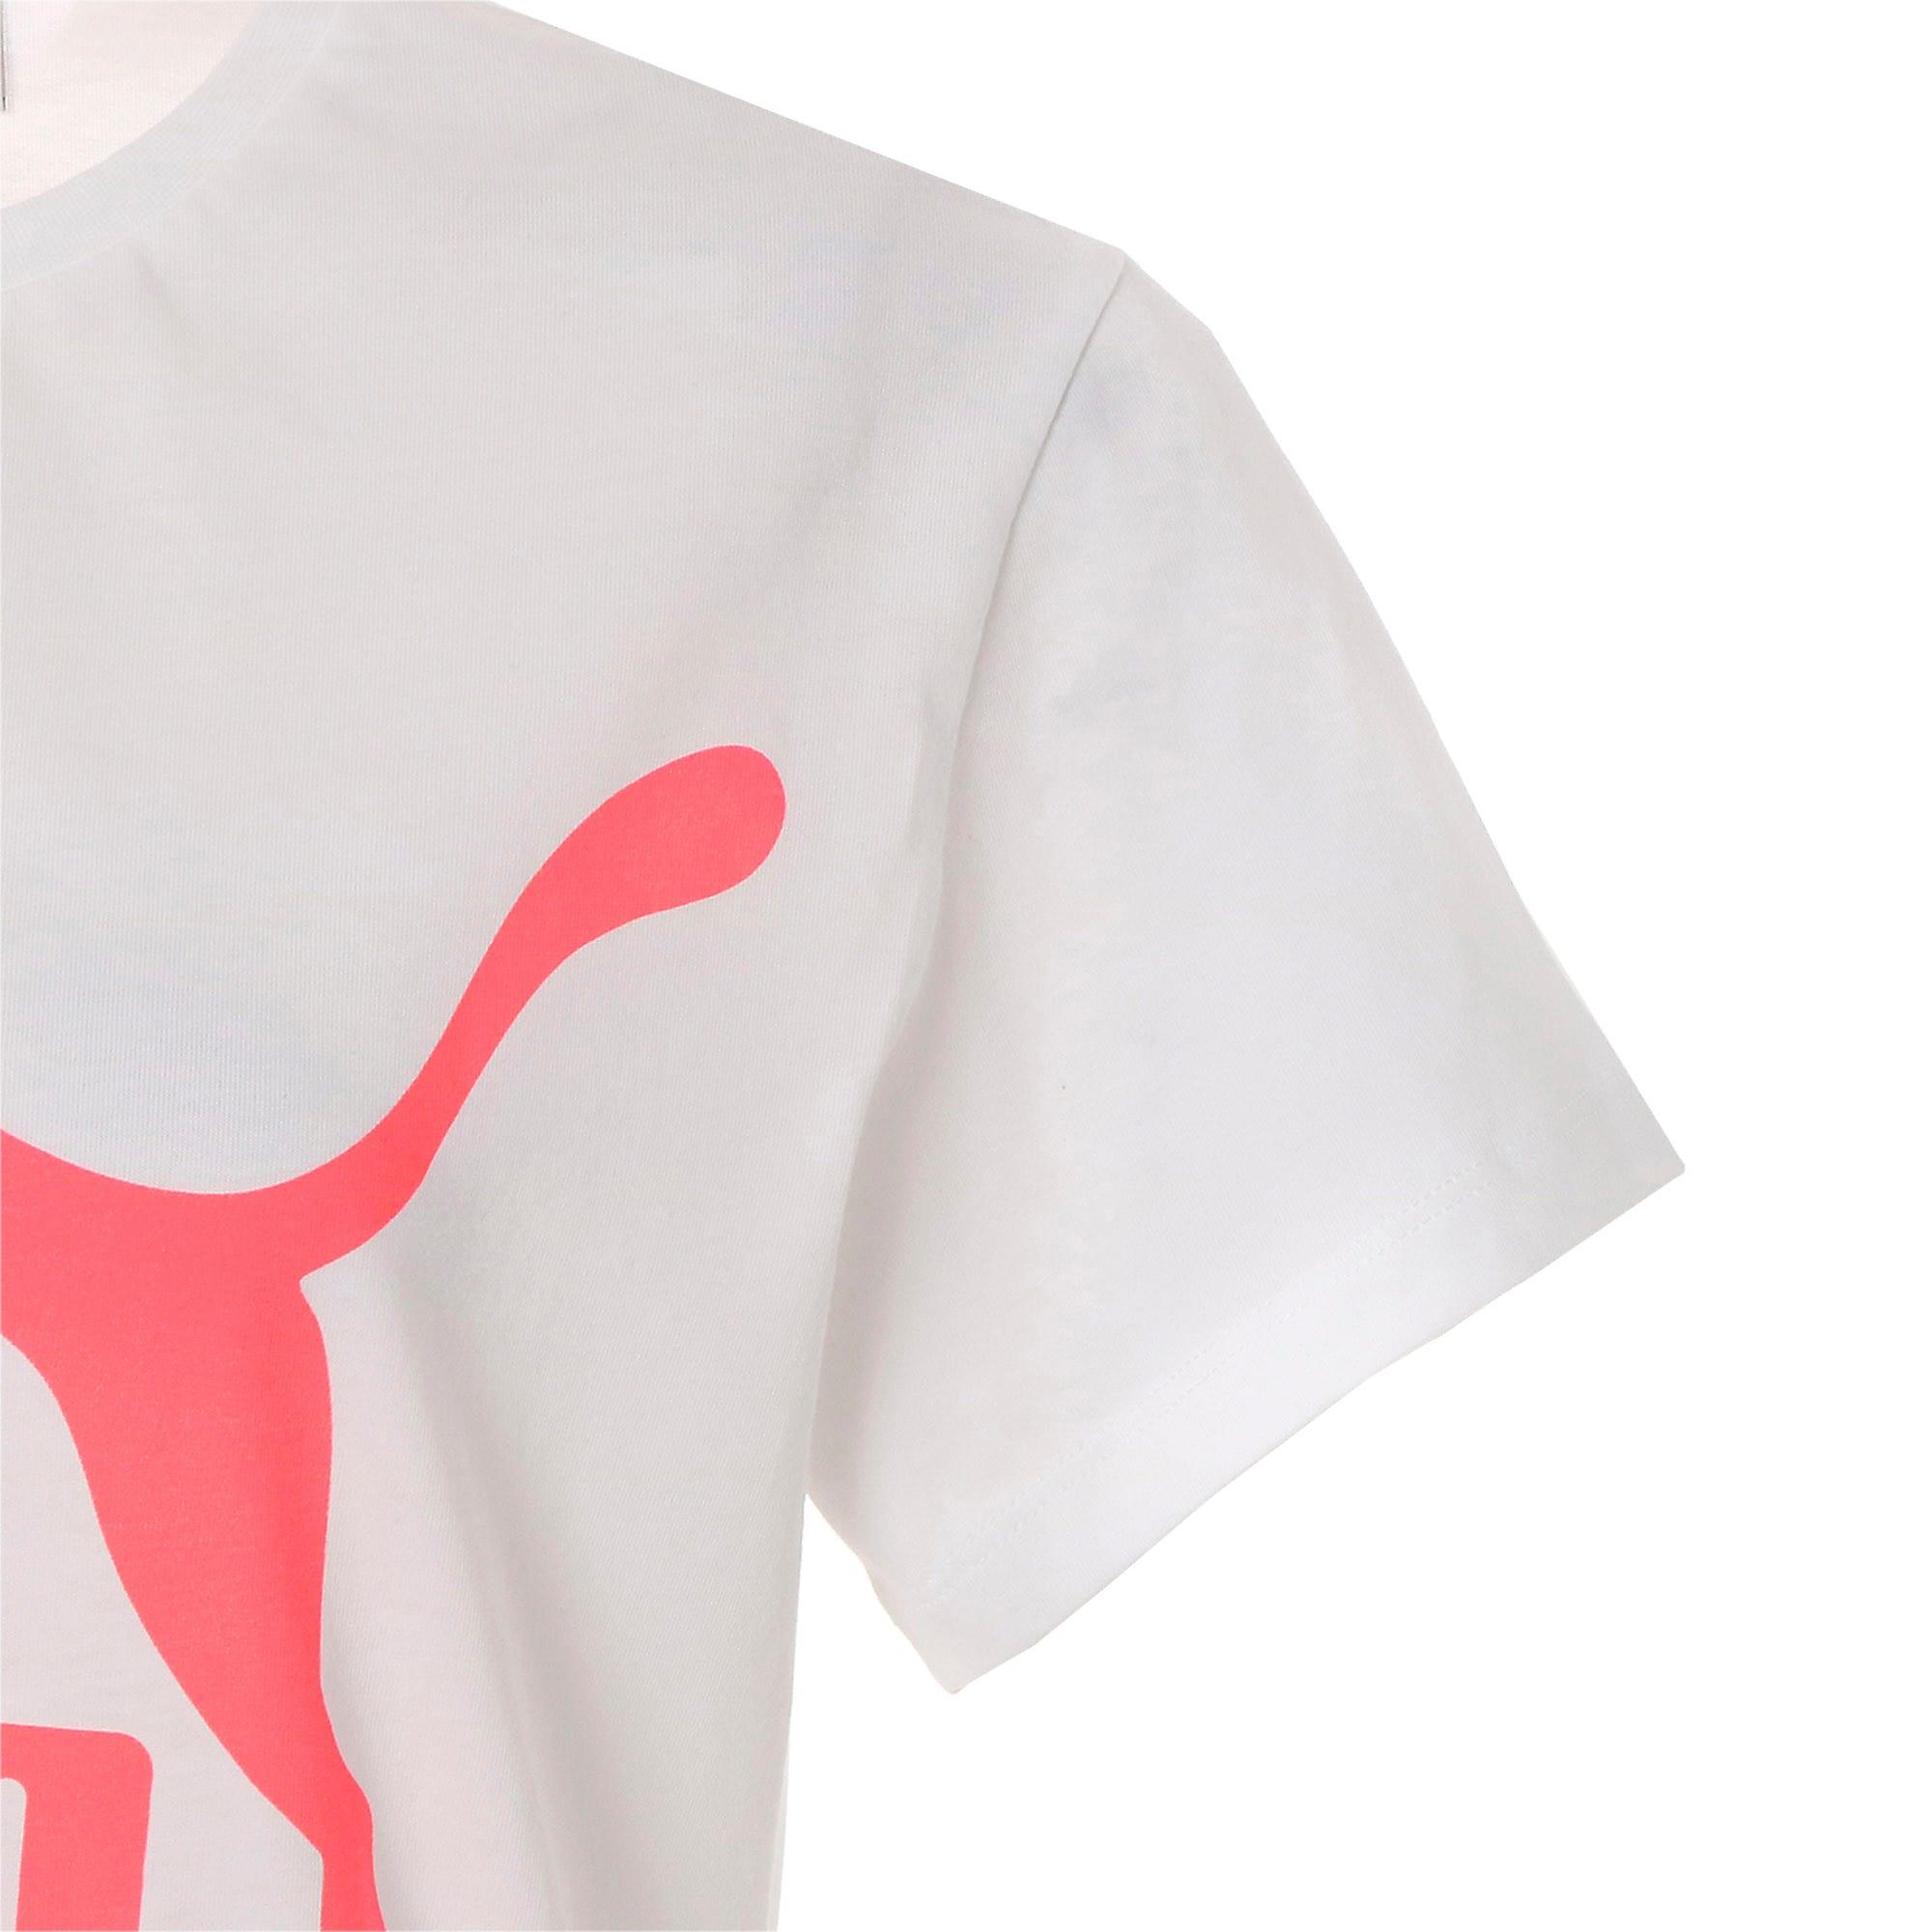 Thumbnail 8 of CLASSICS ロゴ ウィメンズ SS Tシャツ, Puma White, medium-JPN